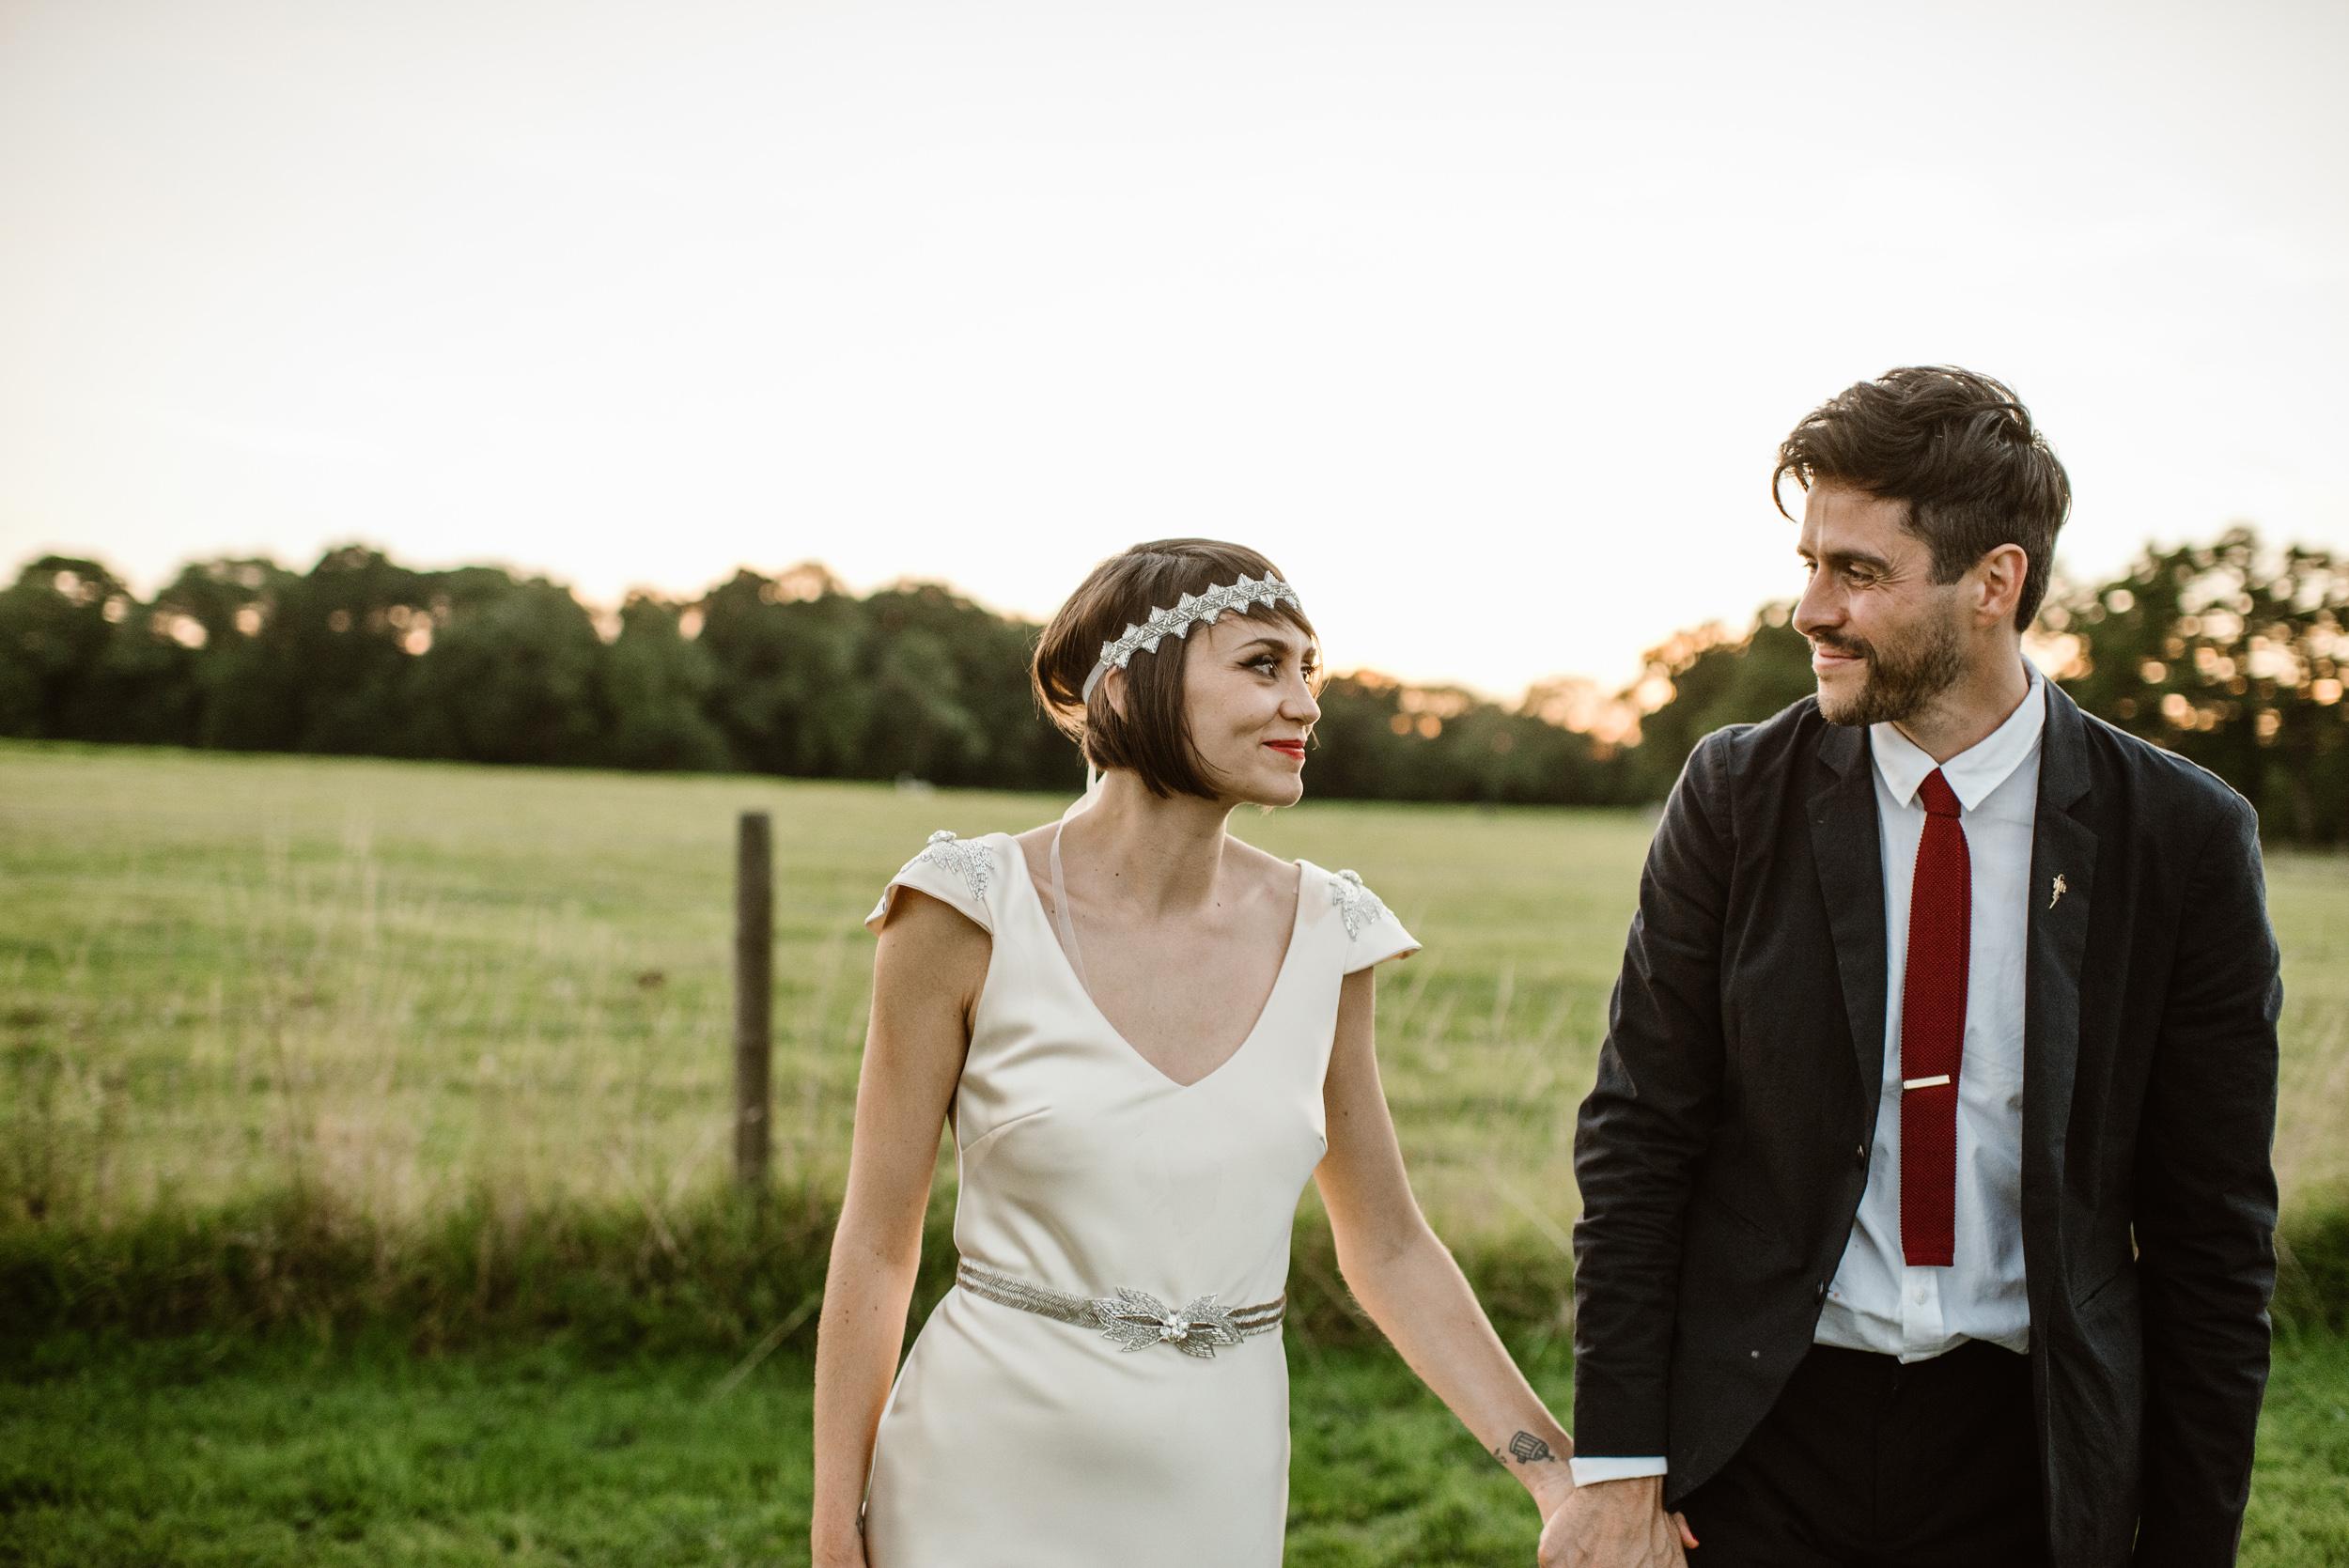 Ro-Kate-Beaumont-bias-cut-silk-wedding-gown-back-garden-wedding-by-Ellie-Gillard-27.jpg